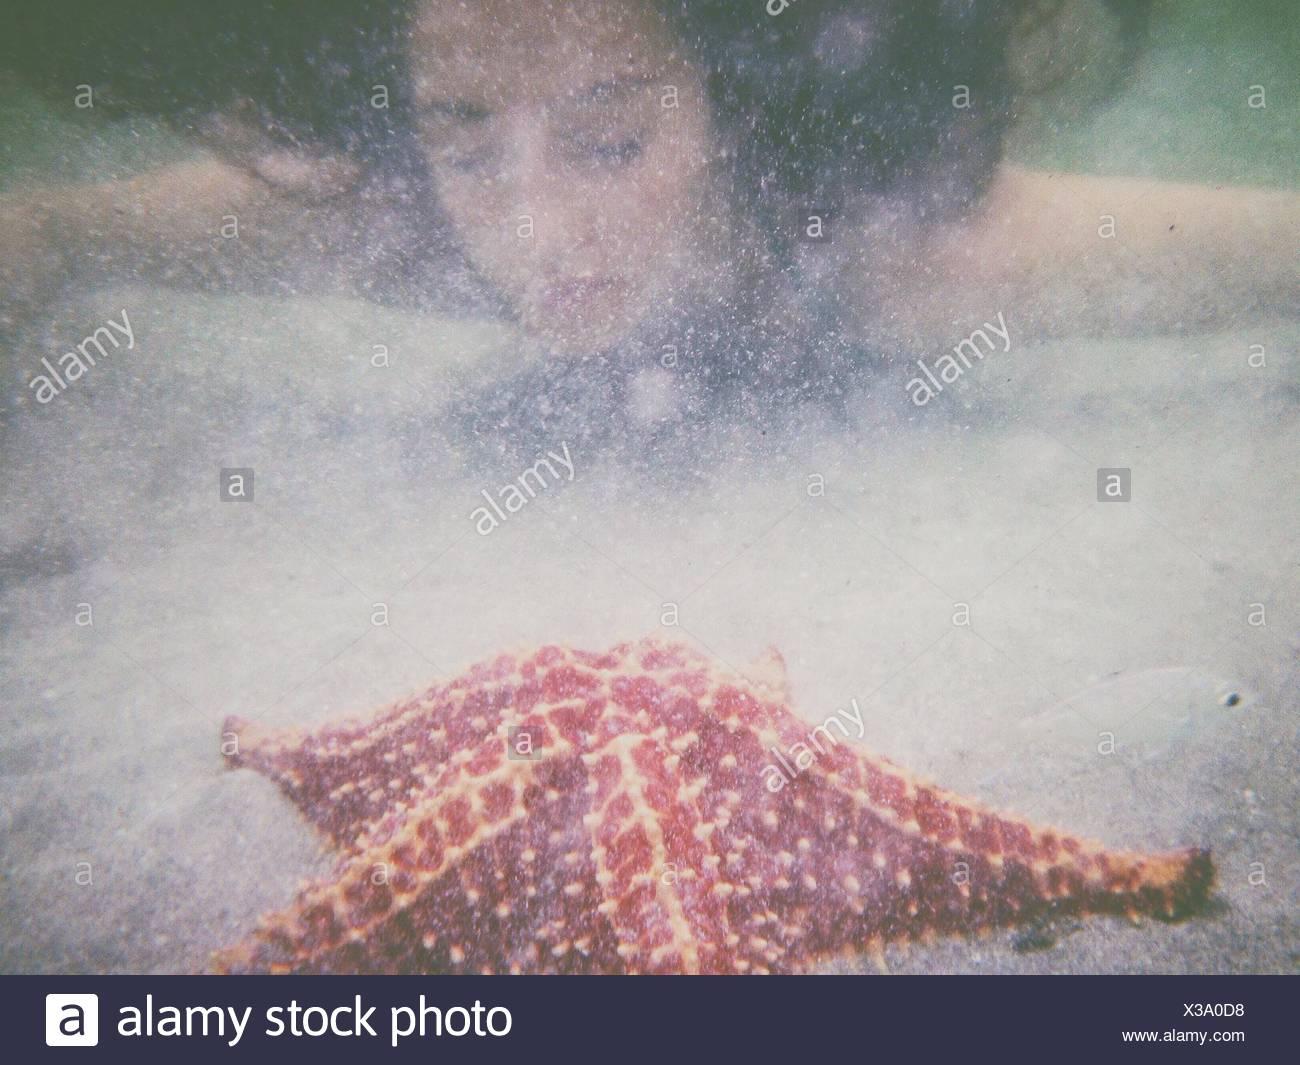 Young Woman swimming in Sea Photo Stock